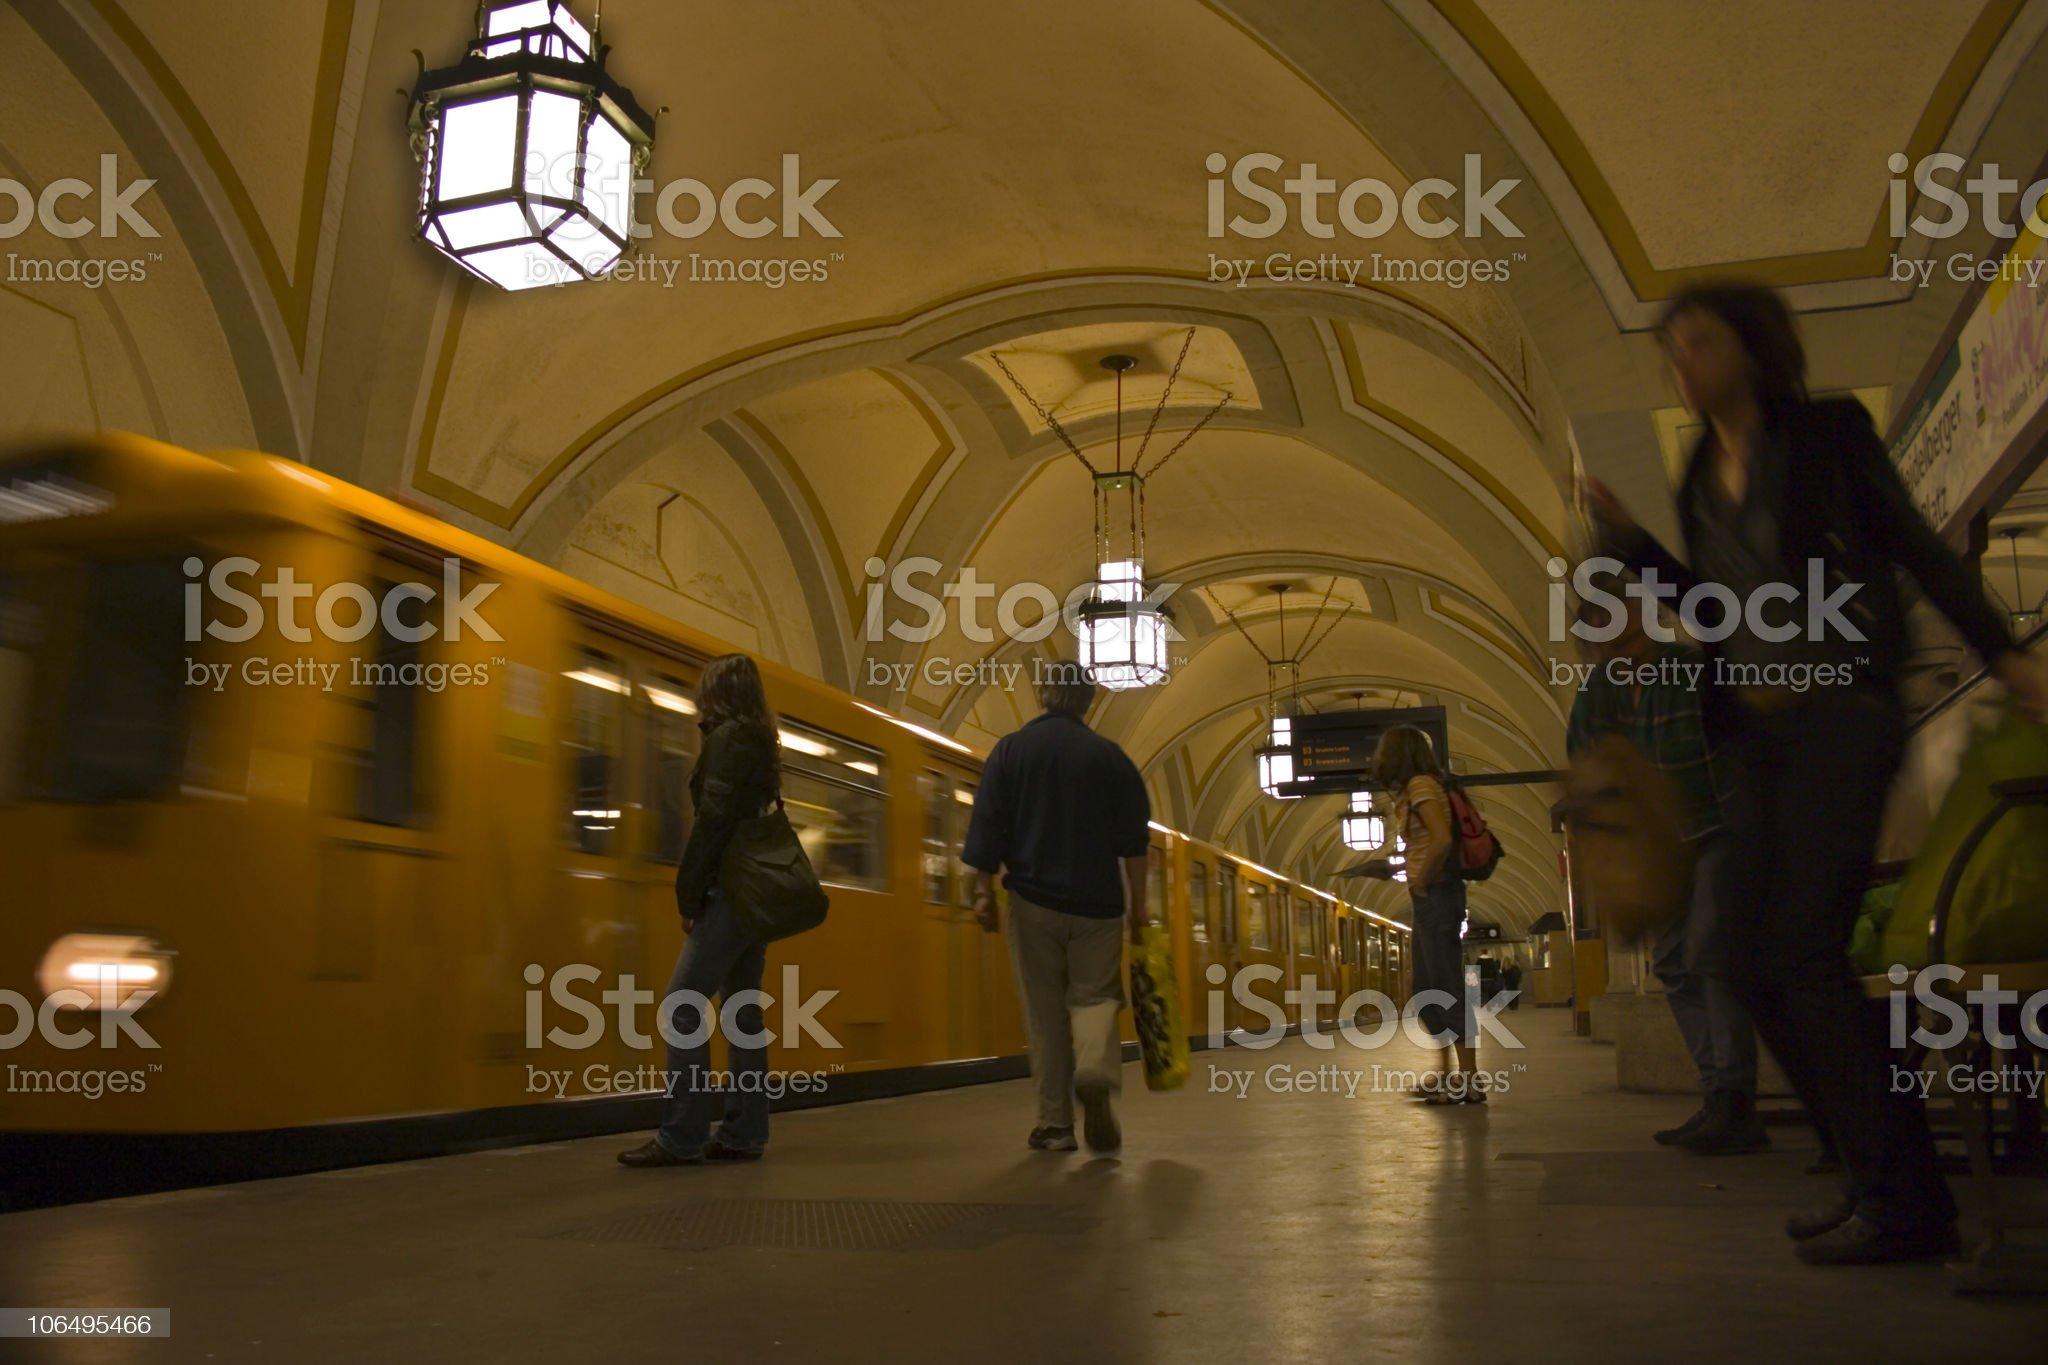 Subway Station 'Heidelberger Platz' royalty-free stock photo